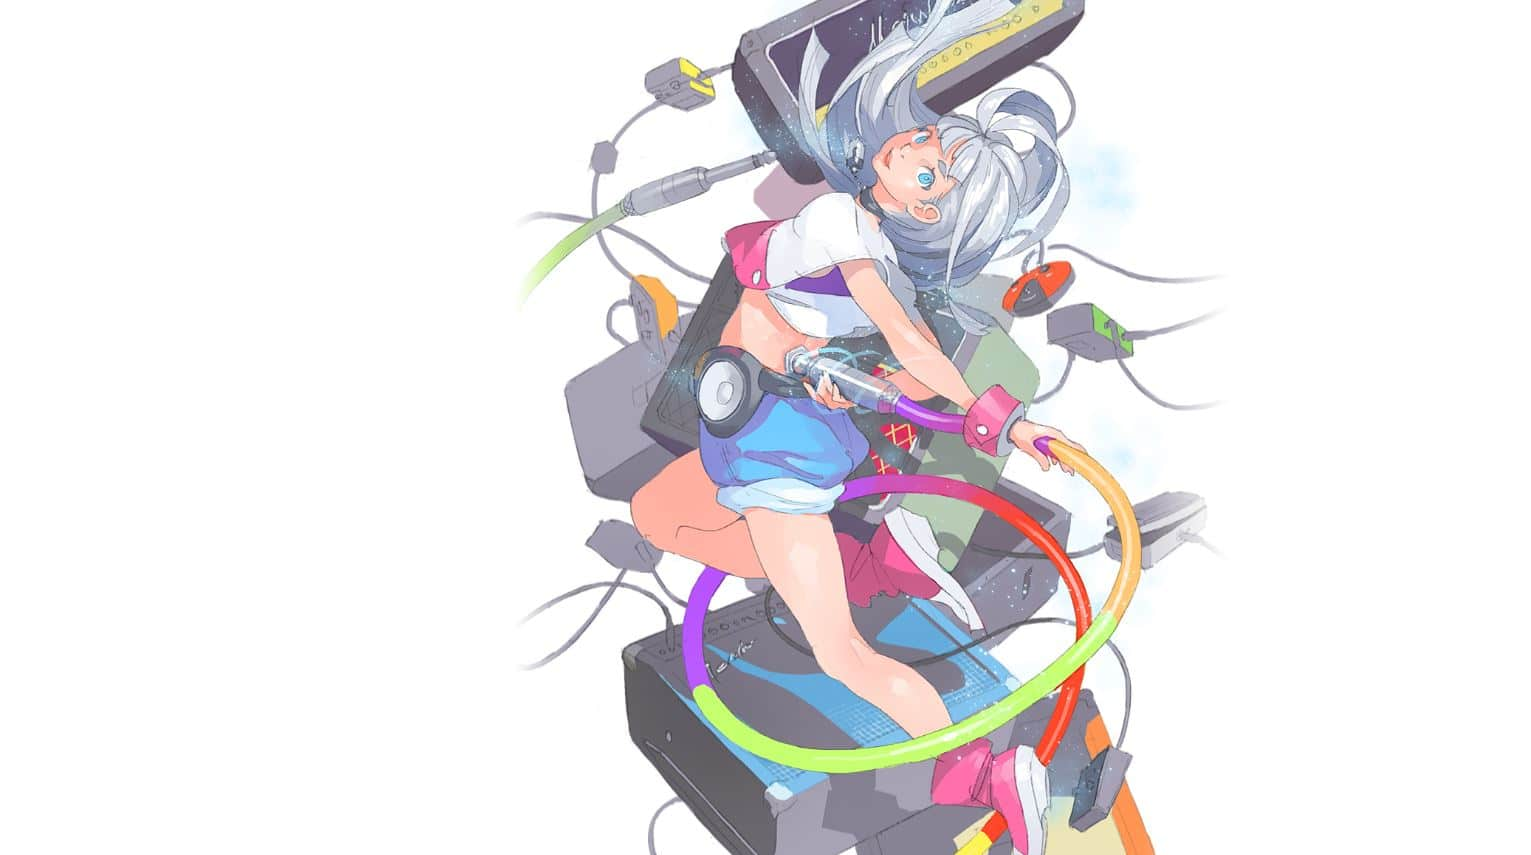 LISTENERS: Starttermin des Original-Anime!